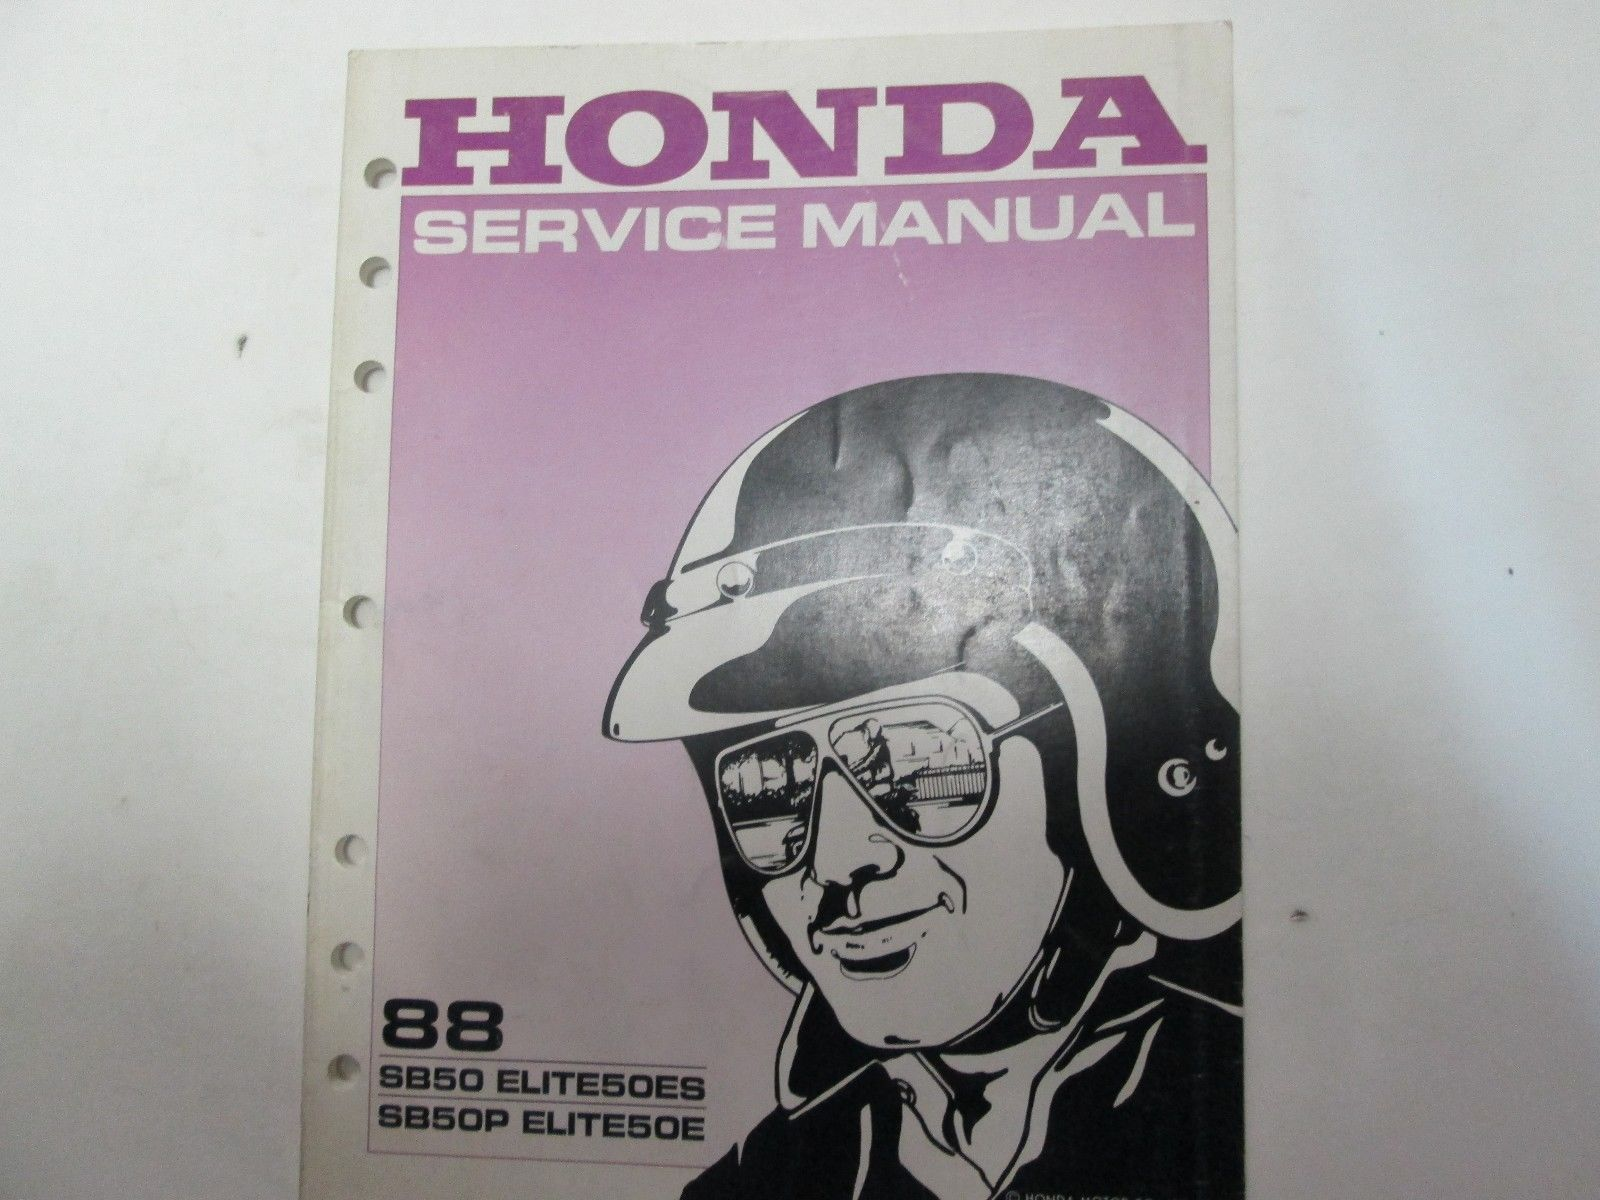 1988 Honda SB50 ELITE50ES SB50P ELITE50E and 50 similar items